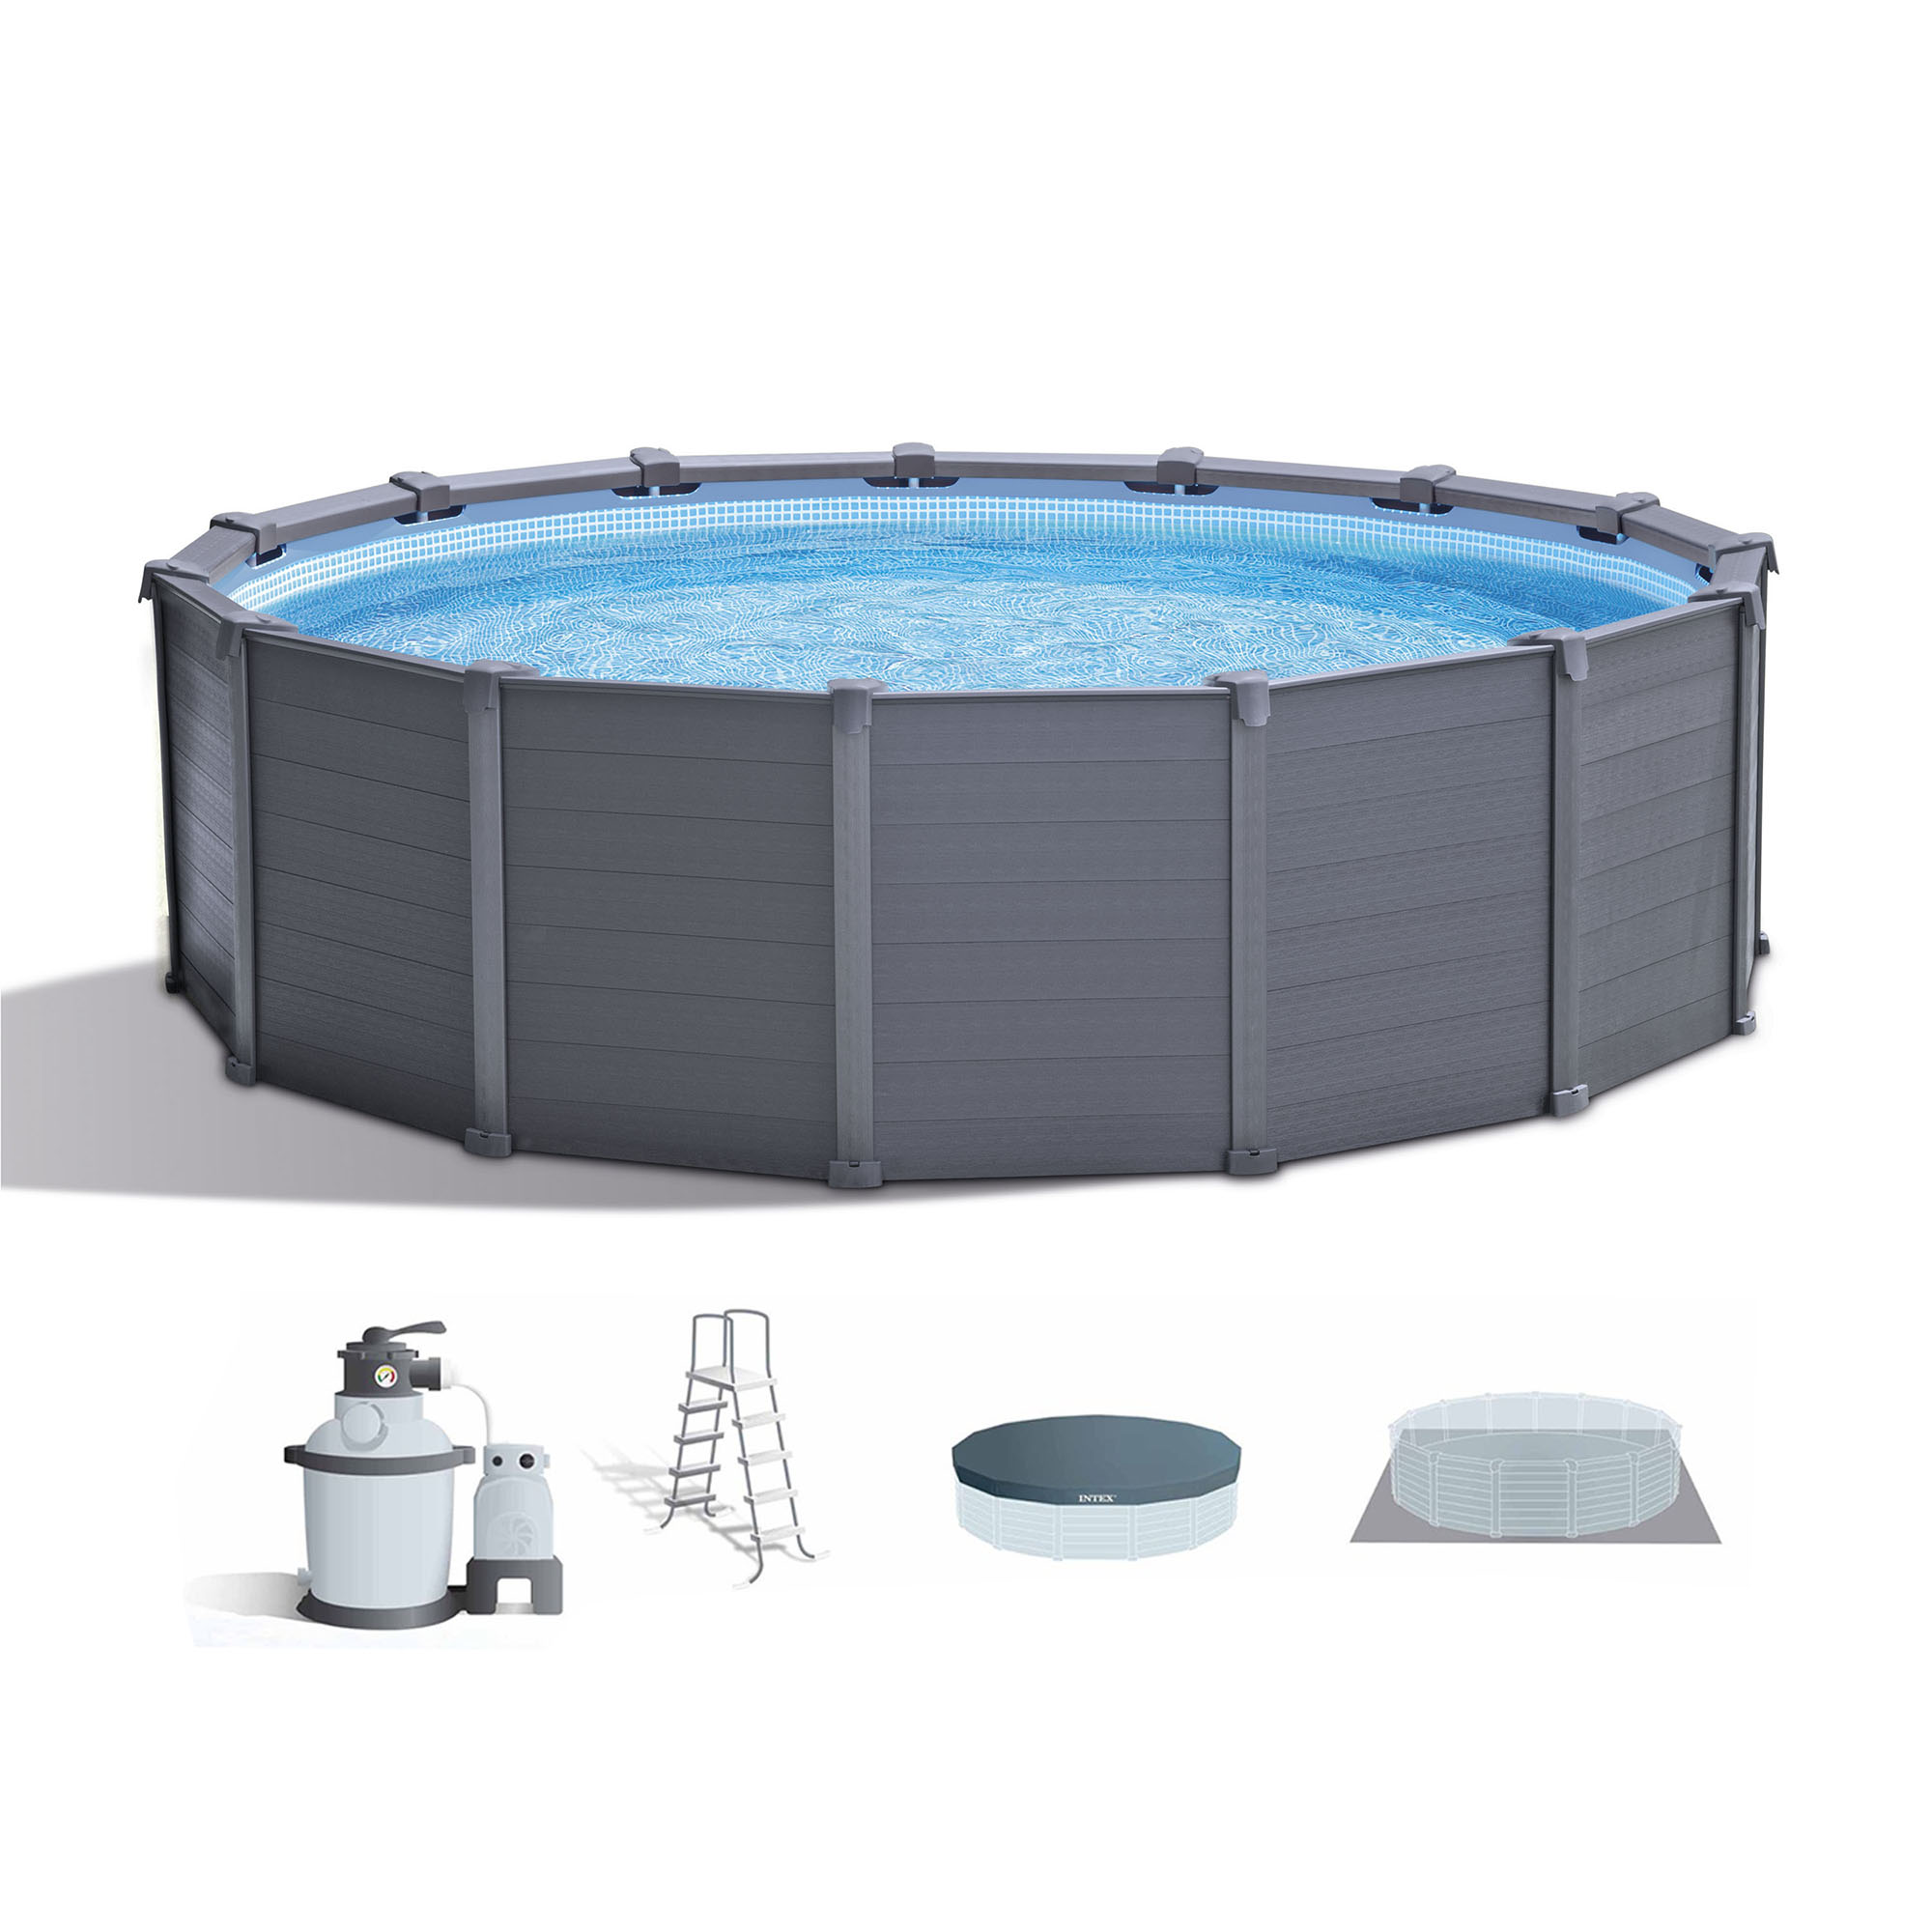 "Intex 15' 8"" x 49"" Above Ground Swimming Pool Set w/ Sand Filter Pump & Ladder"